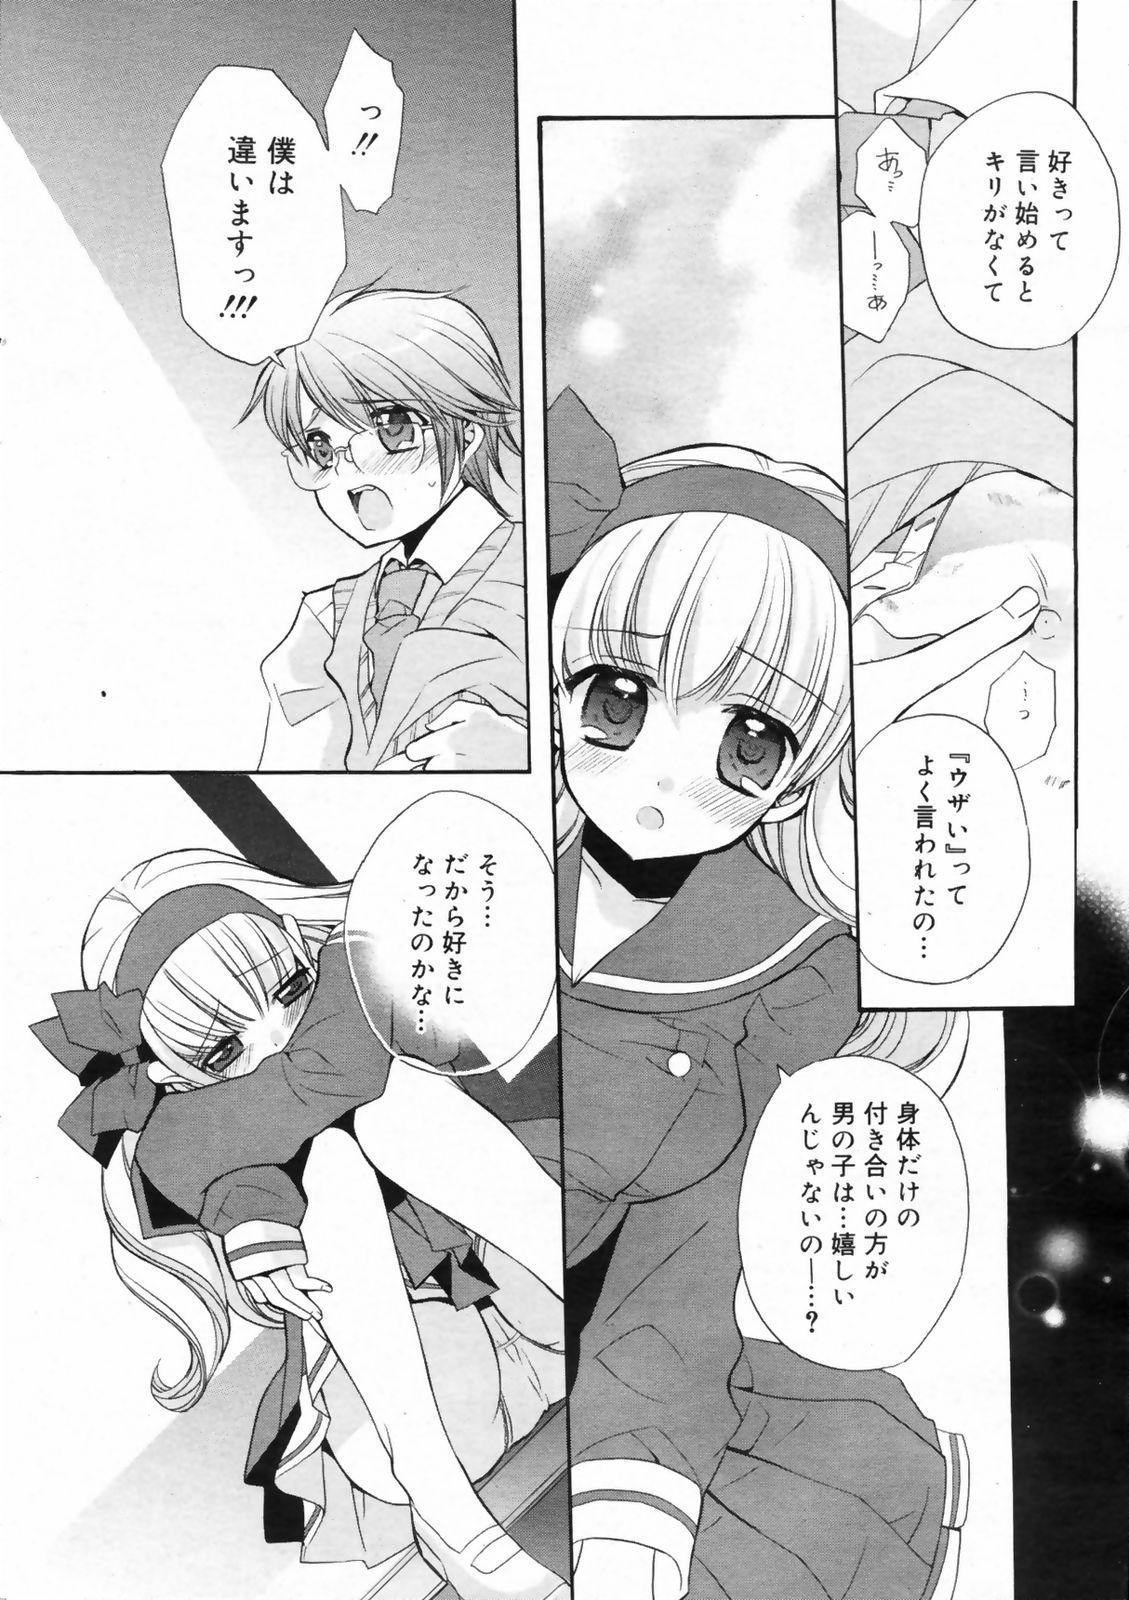 Manga Bangaichi 2009-02 Vol. 234 11